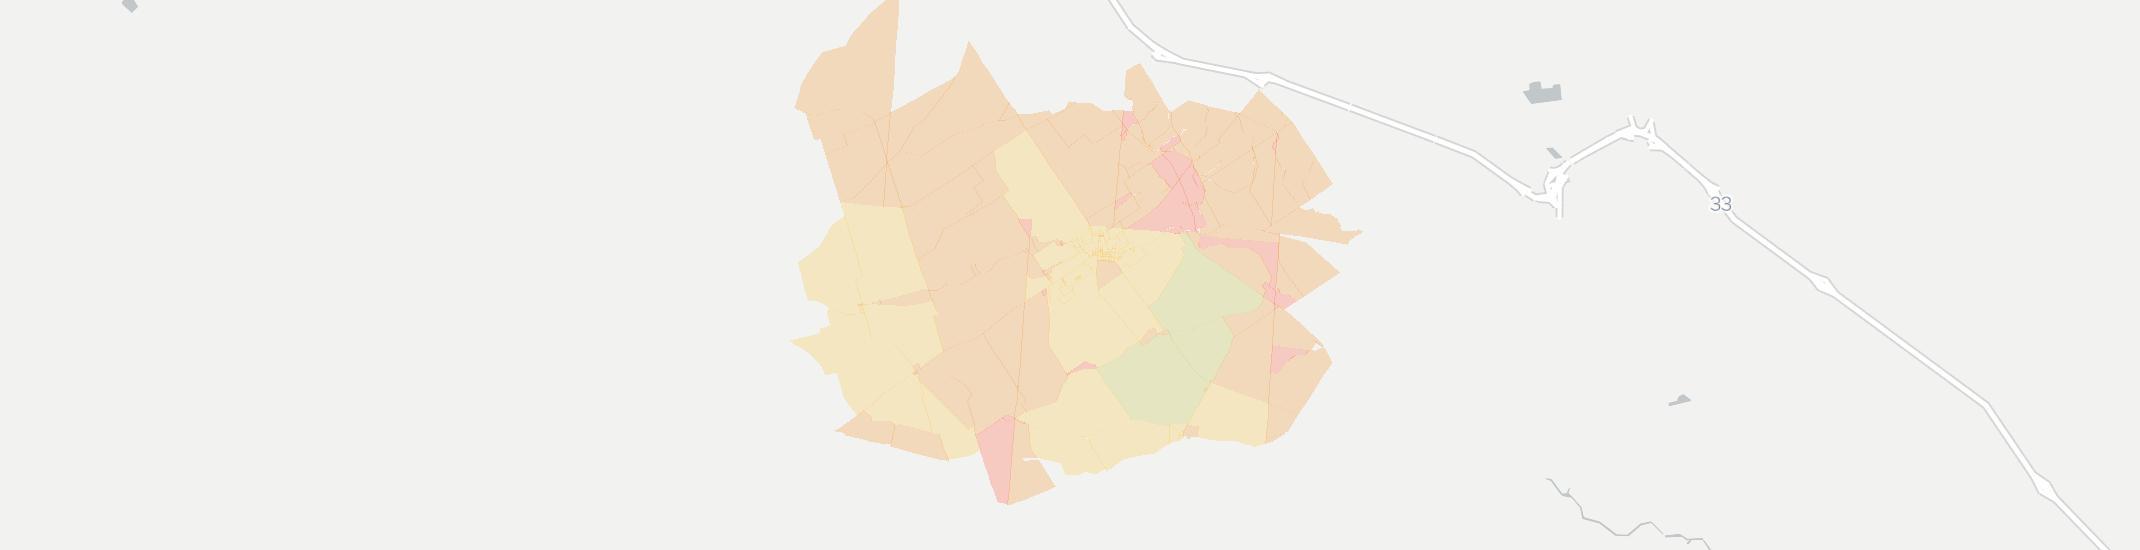 Lewisburg Ohio Map.Internet Providers In North Lewisburg Compare 11 Providers